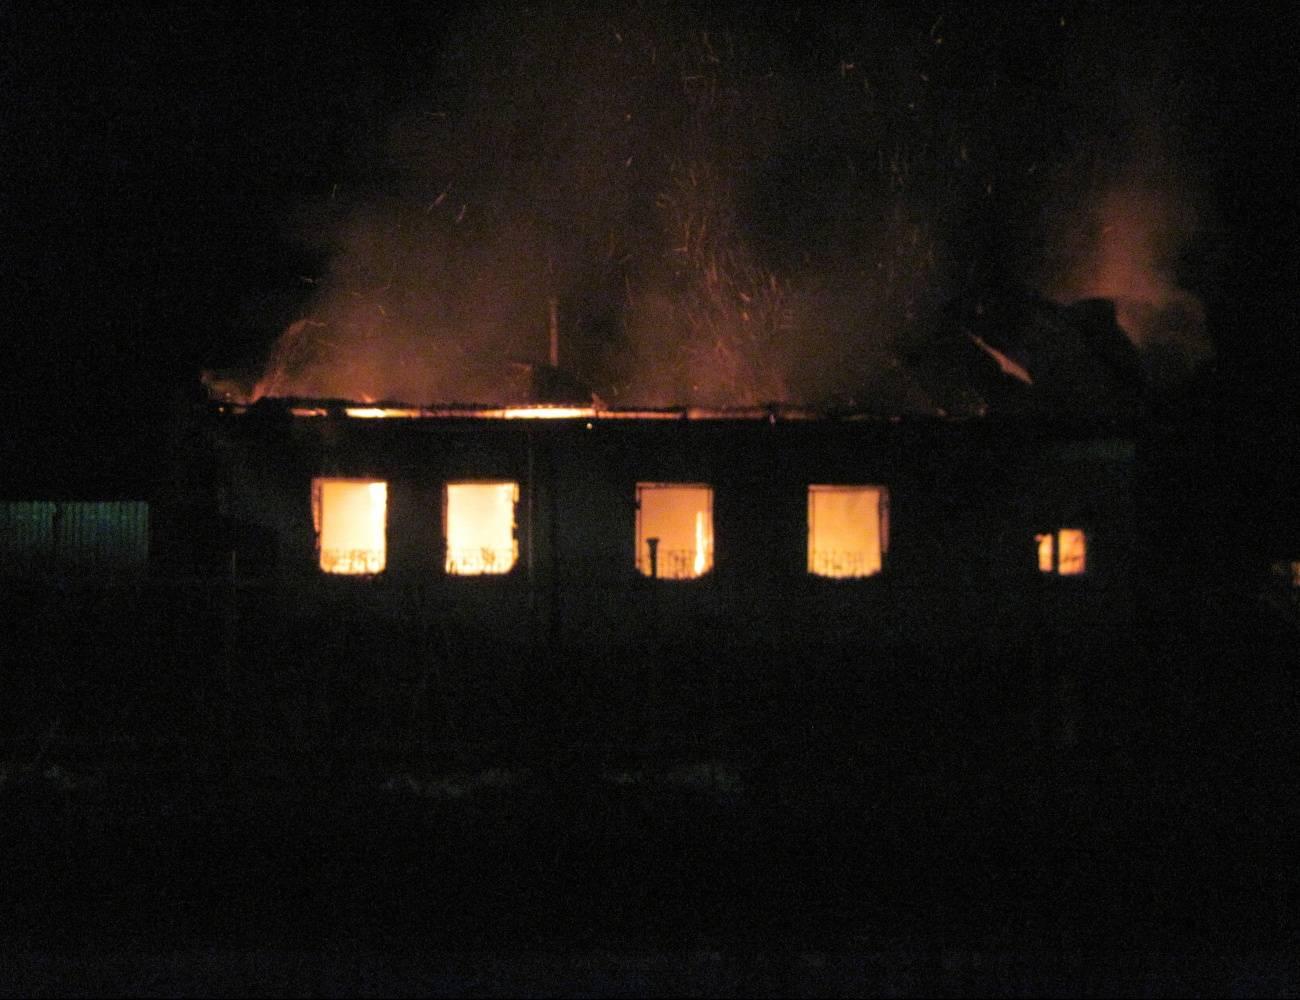 ВМордовии инвалид покончил ссобой, спалив дом №13